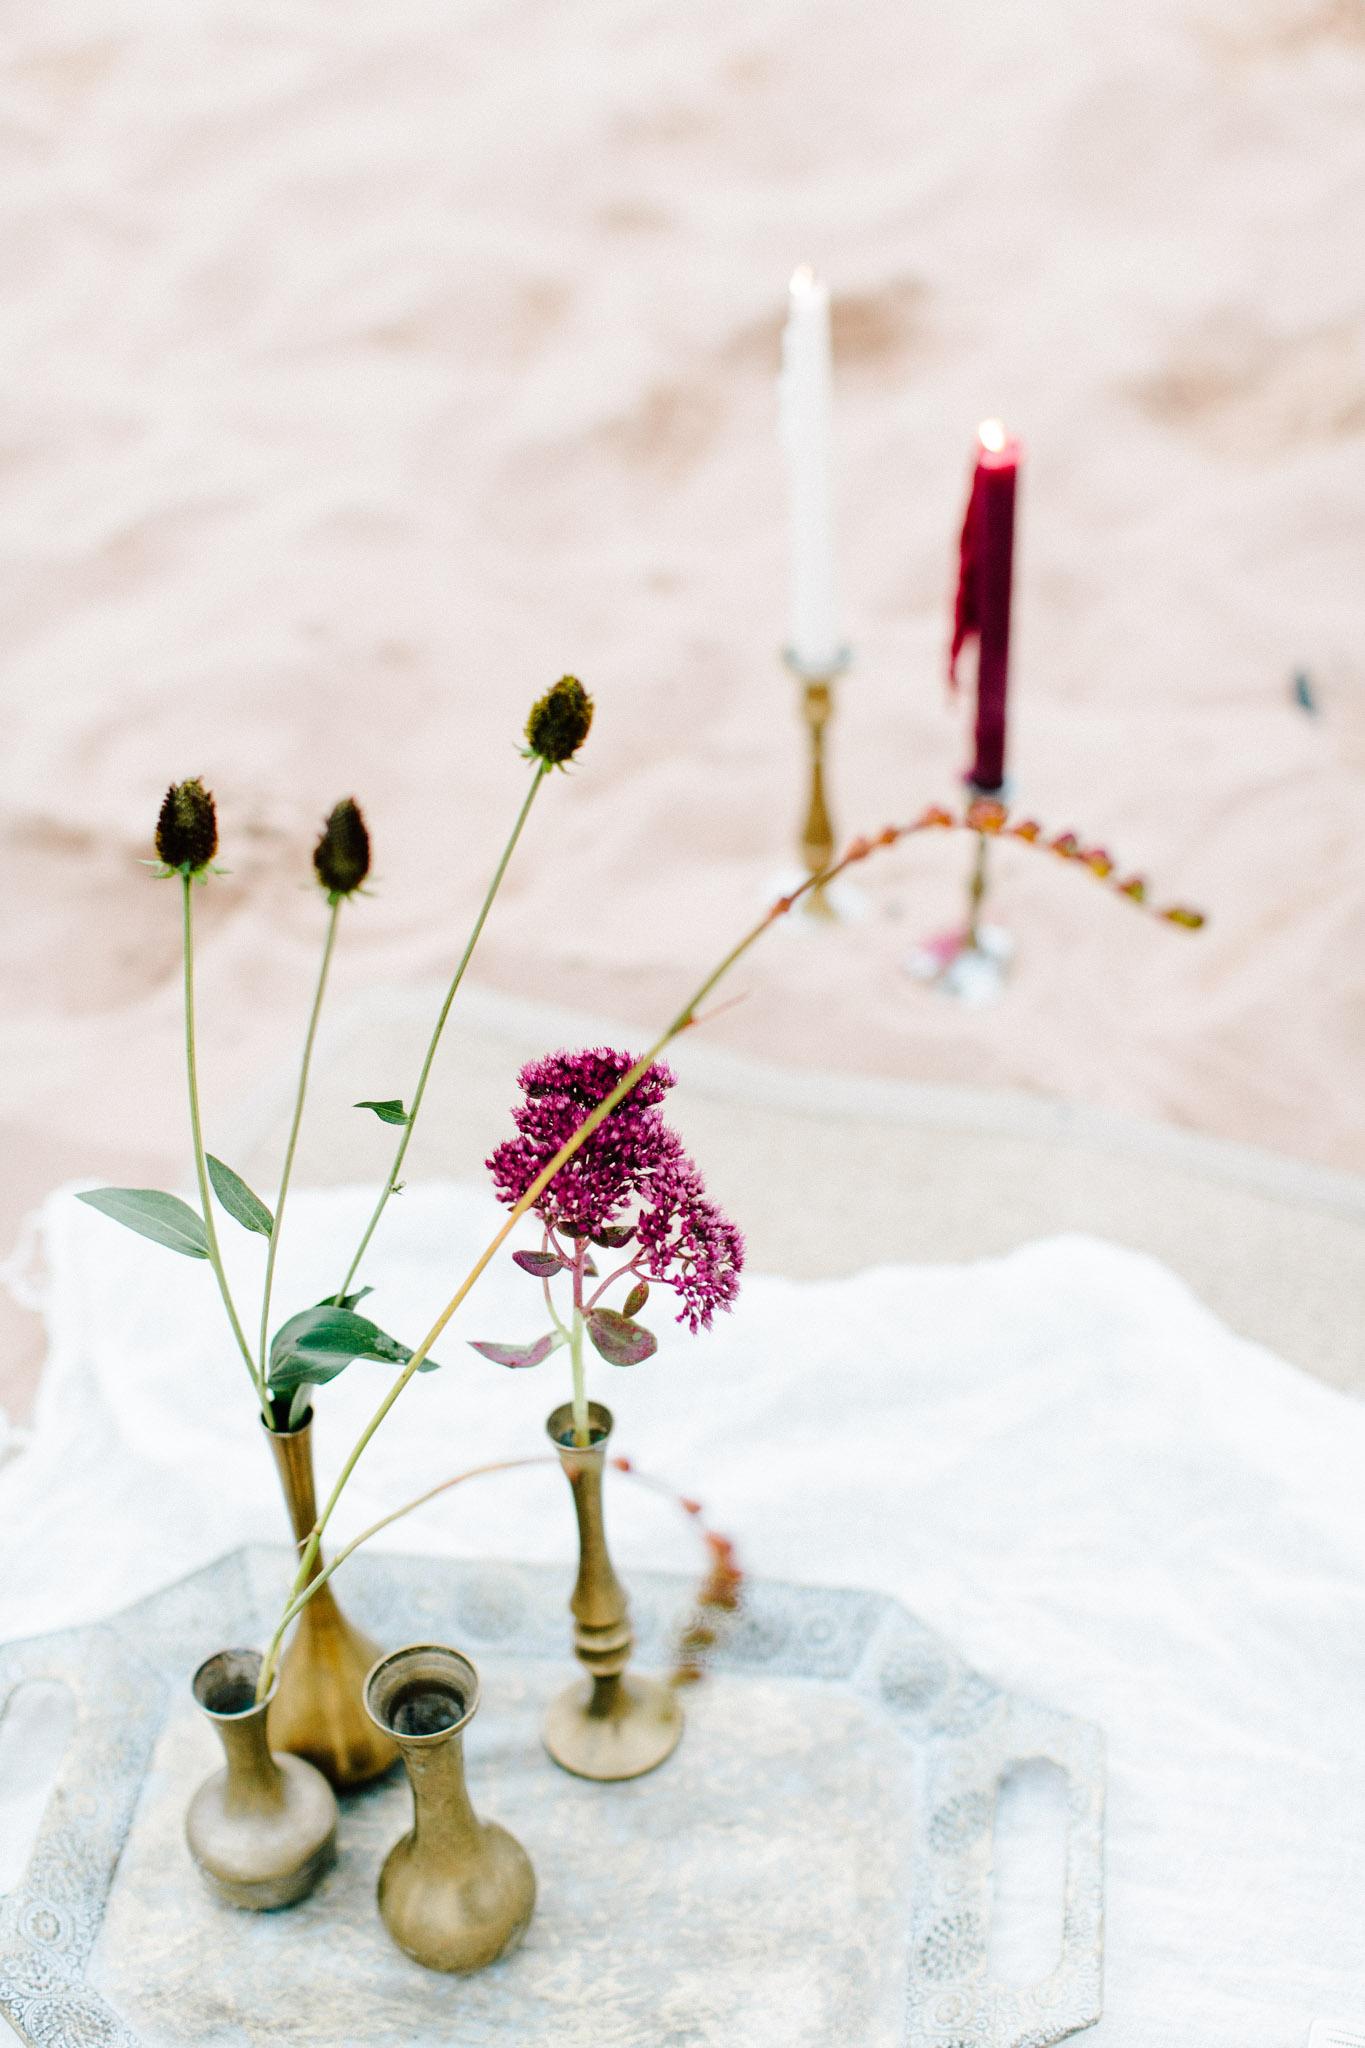 Speyer-Moroccan-Wedding-Inspiration-Pia-Anna-Christian-Wedding-Photography-S-63.jpg